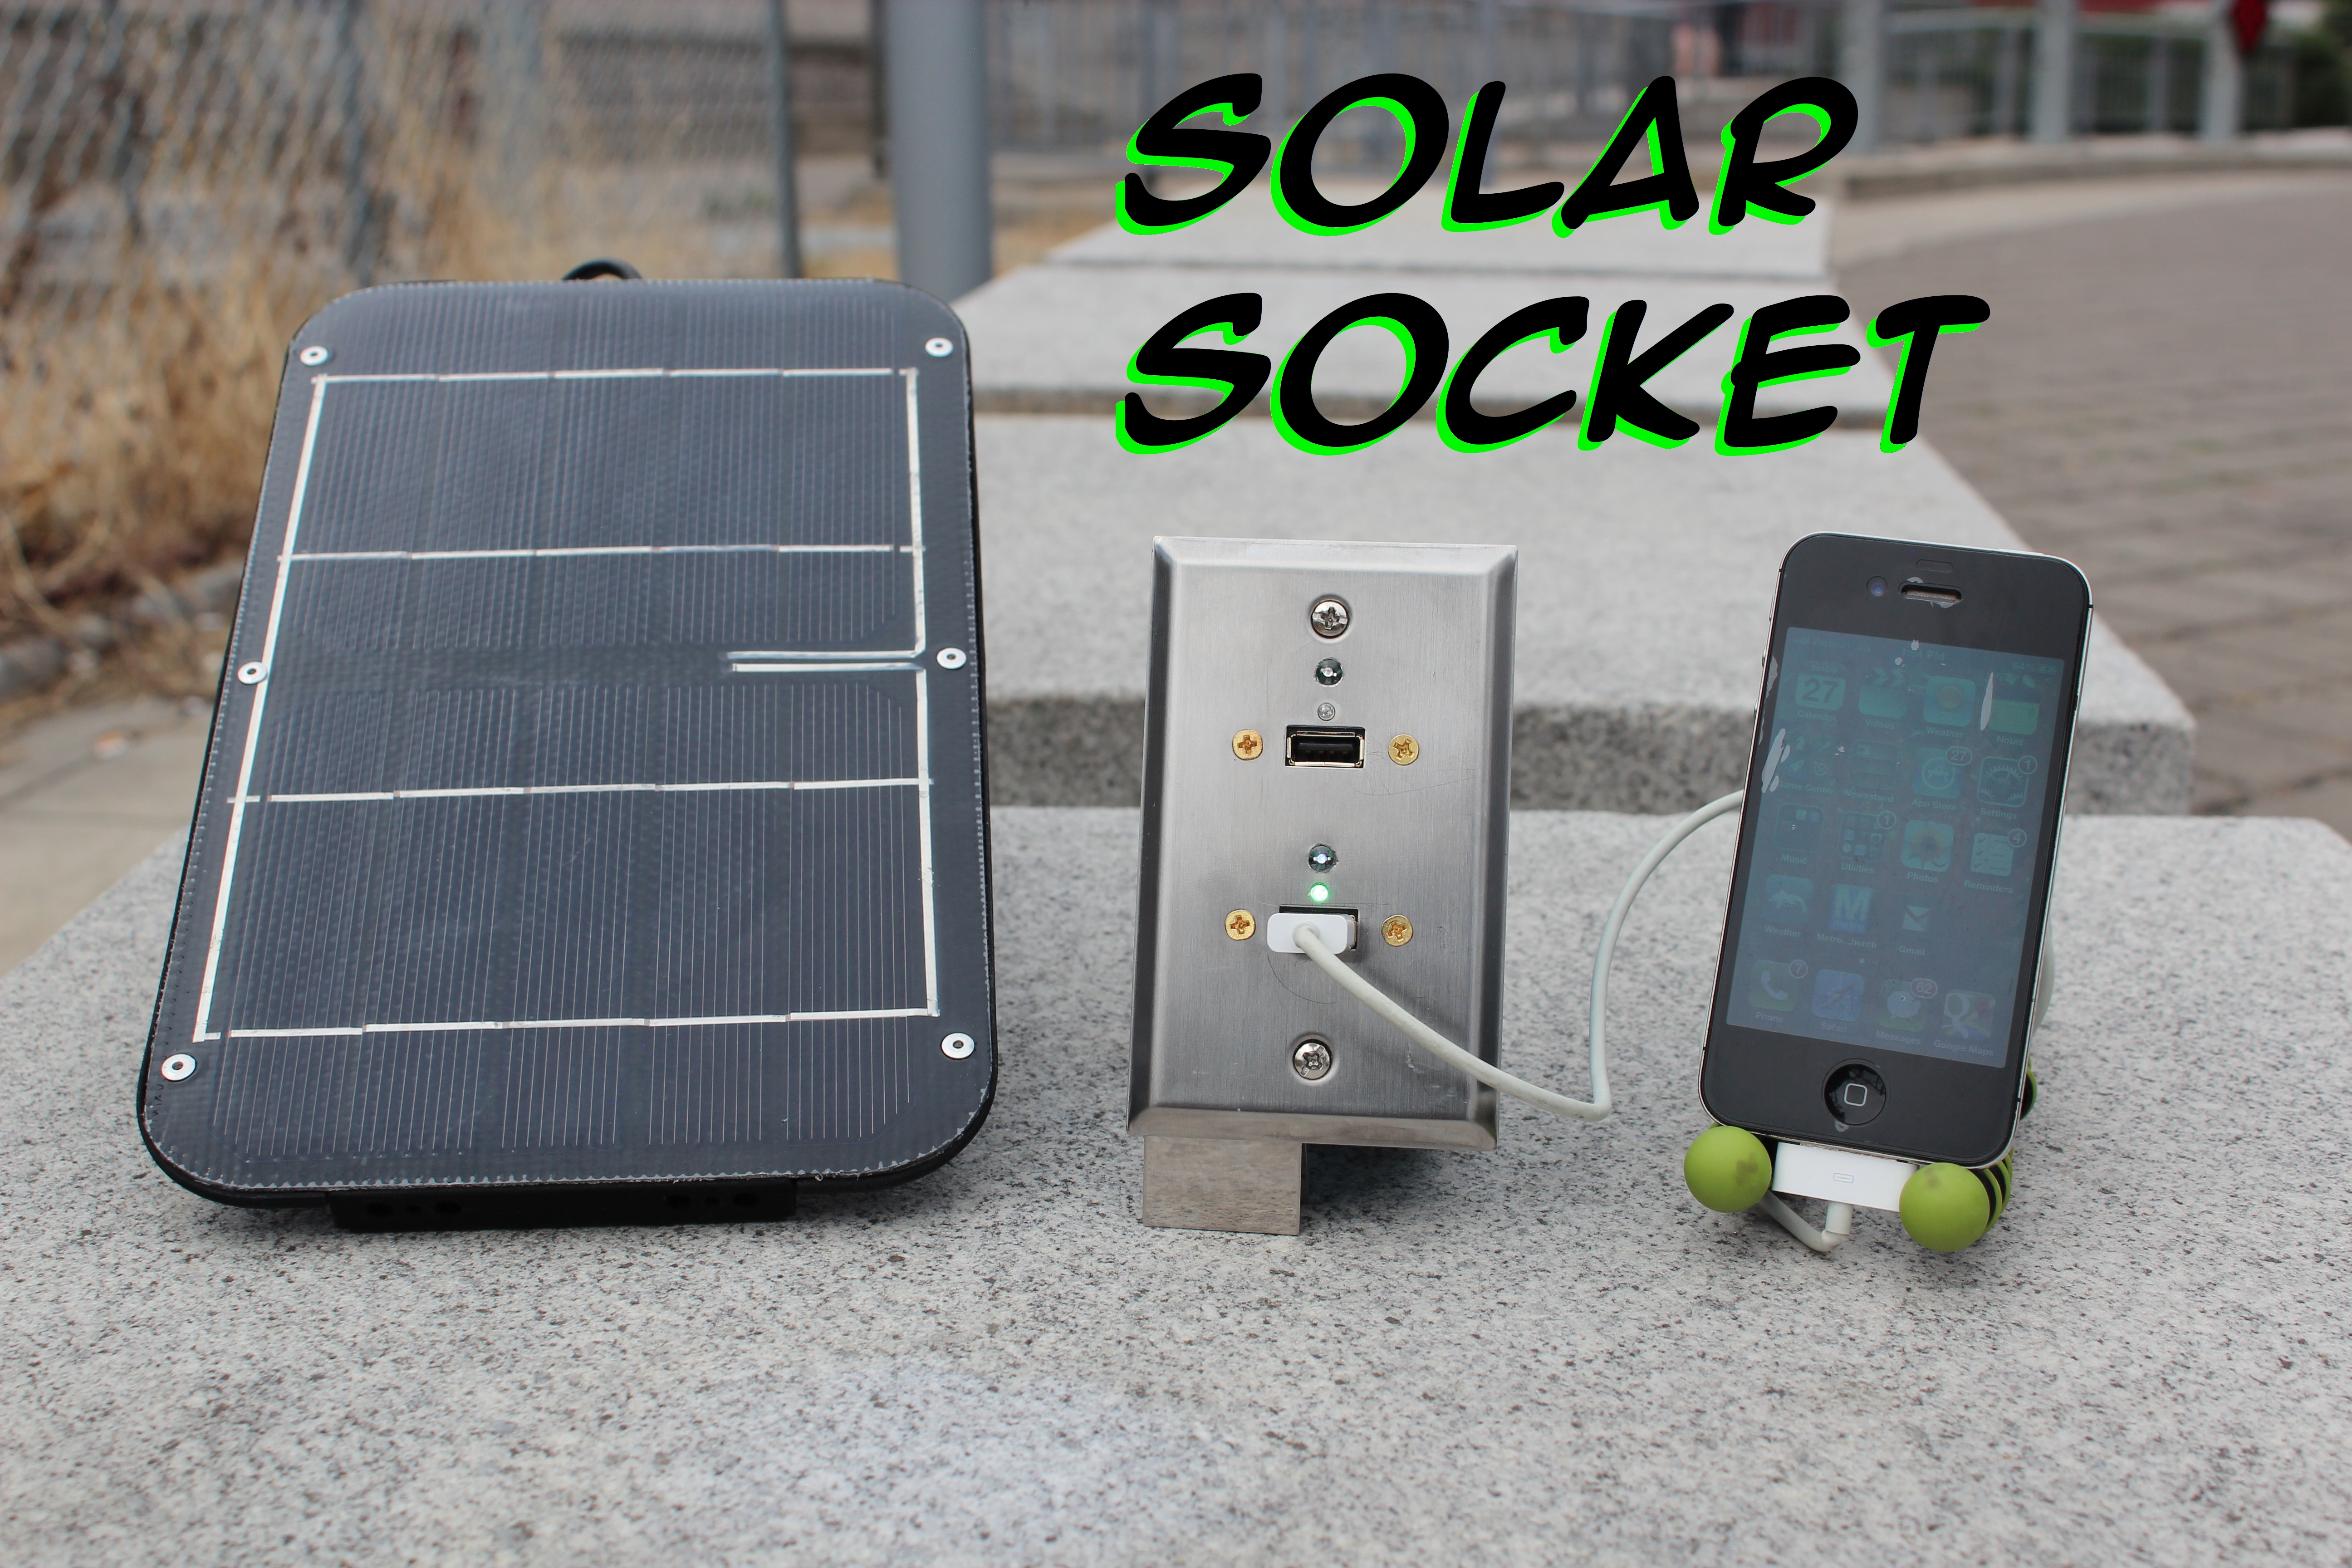 Picture of Emergency USB Solar Wall Socket: Solar Socket